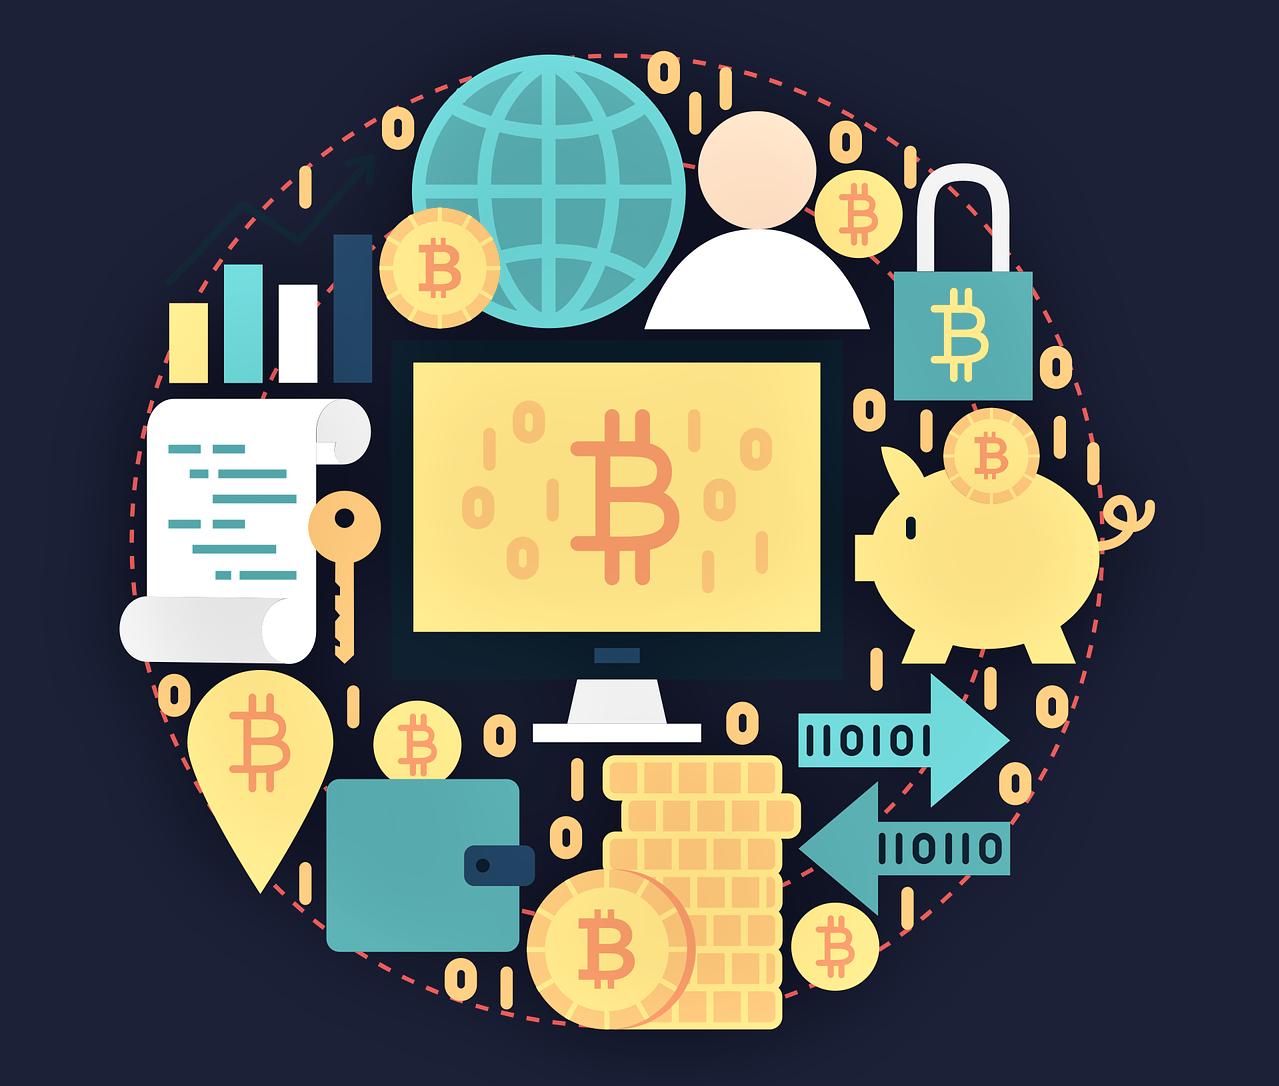 Blockchain Bitcoin Smart contract Infrastruktur Cardano Michael Demanega Innovation Bauingenieur